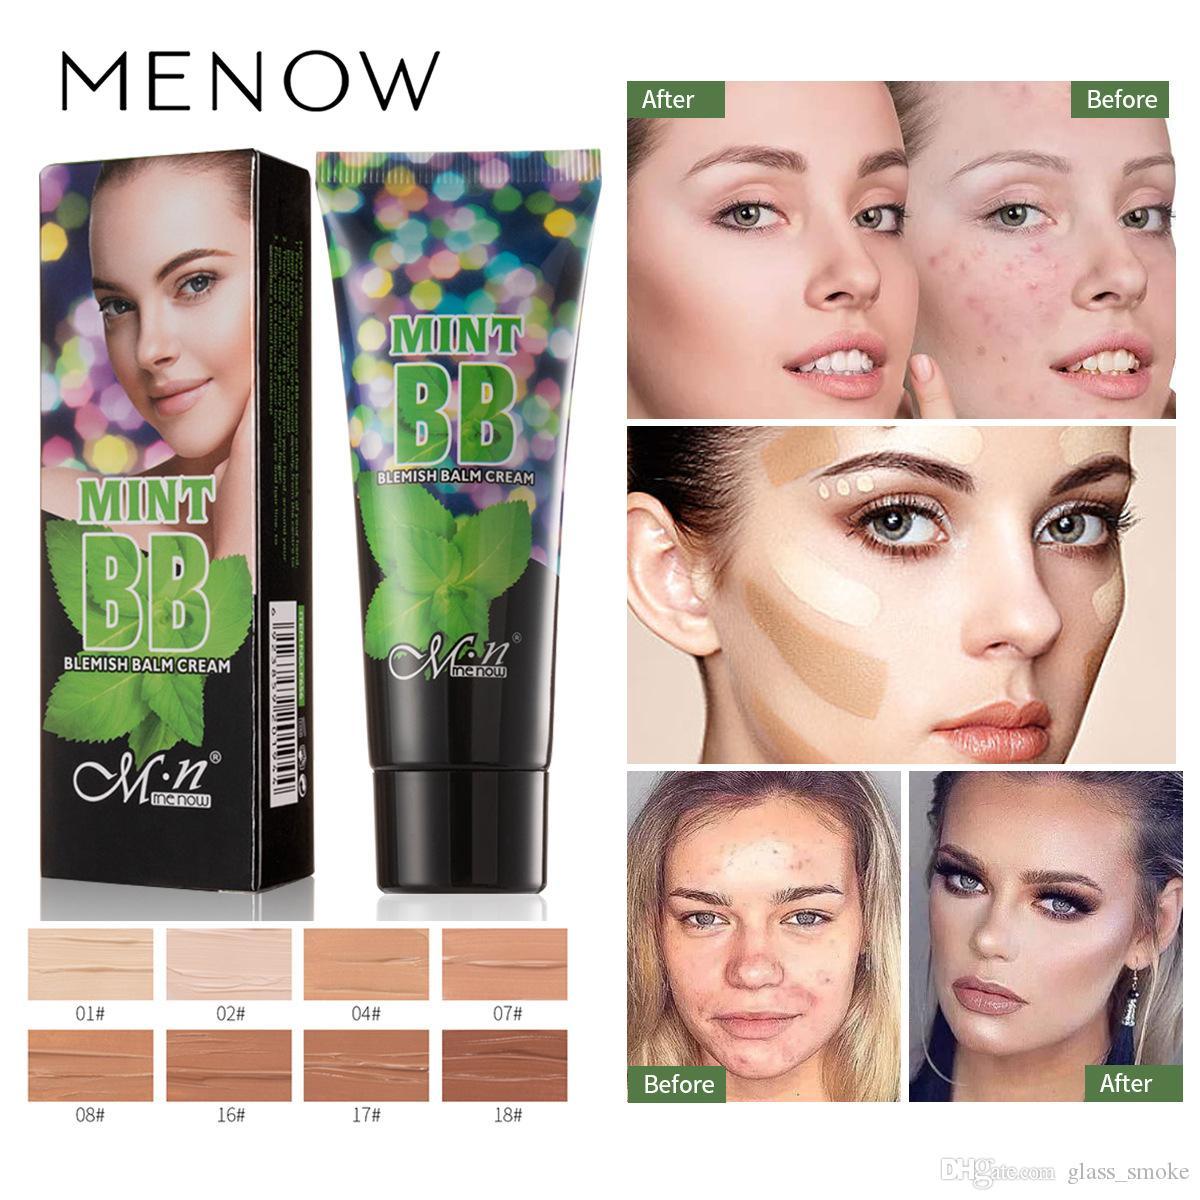 Menow Liquid Foundation Водонепроницаемая Natural Face Foundation BB Cream Увлажняющий Корректор Nude макияж Face Beauty маскирующее Косметика